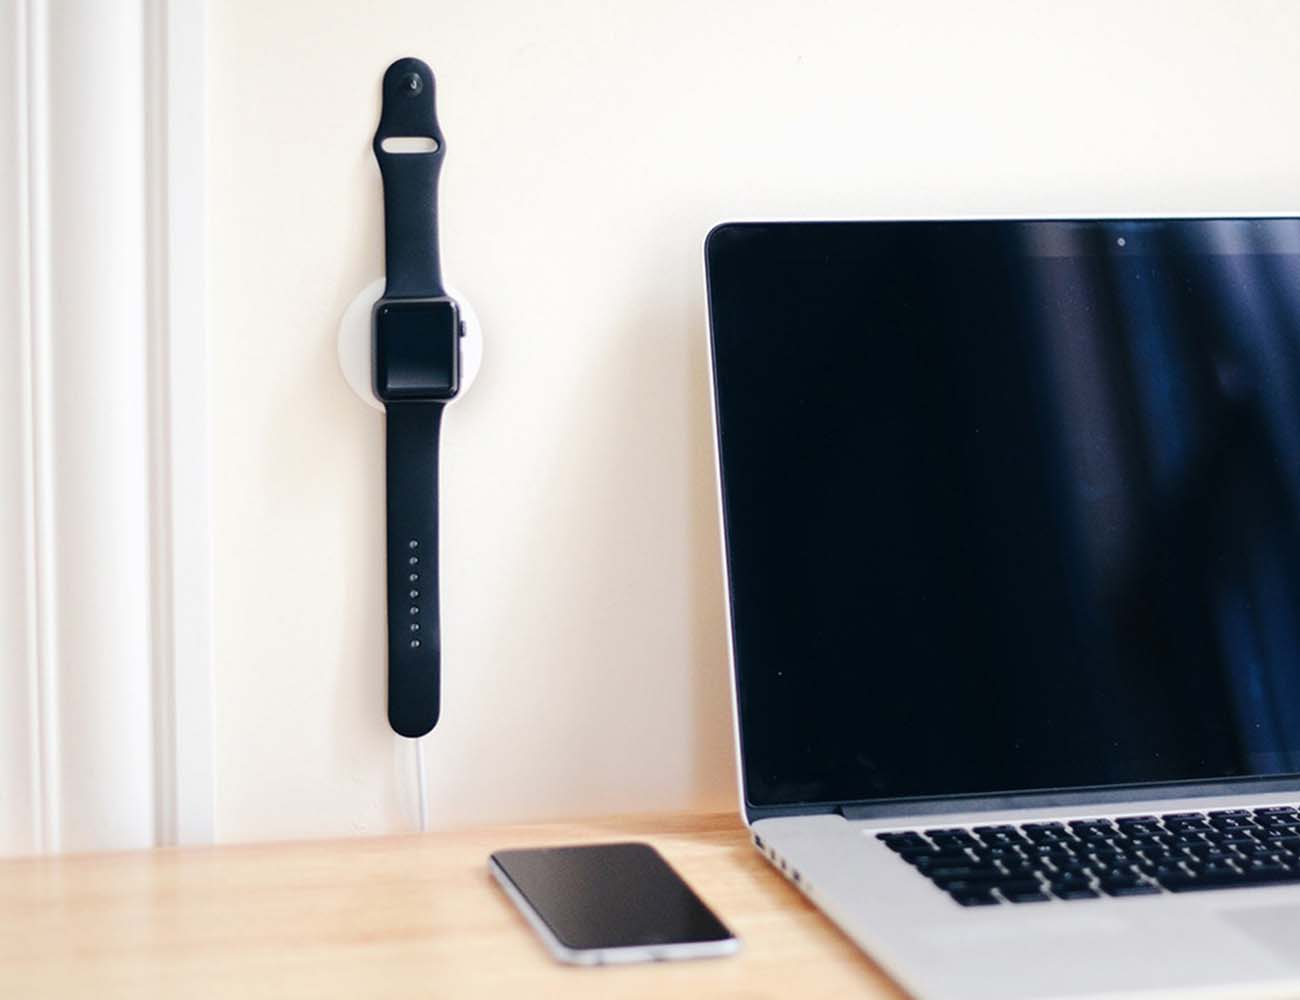 KERO Cling for Apple Watch